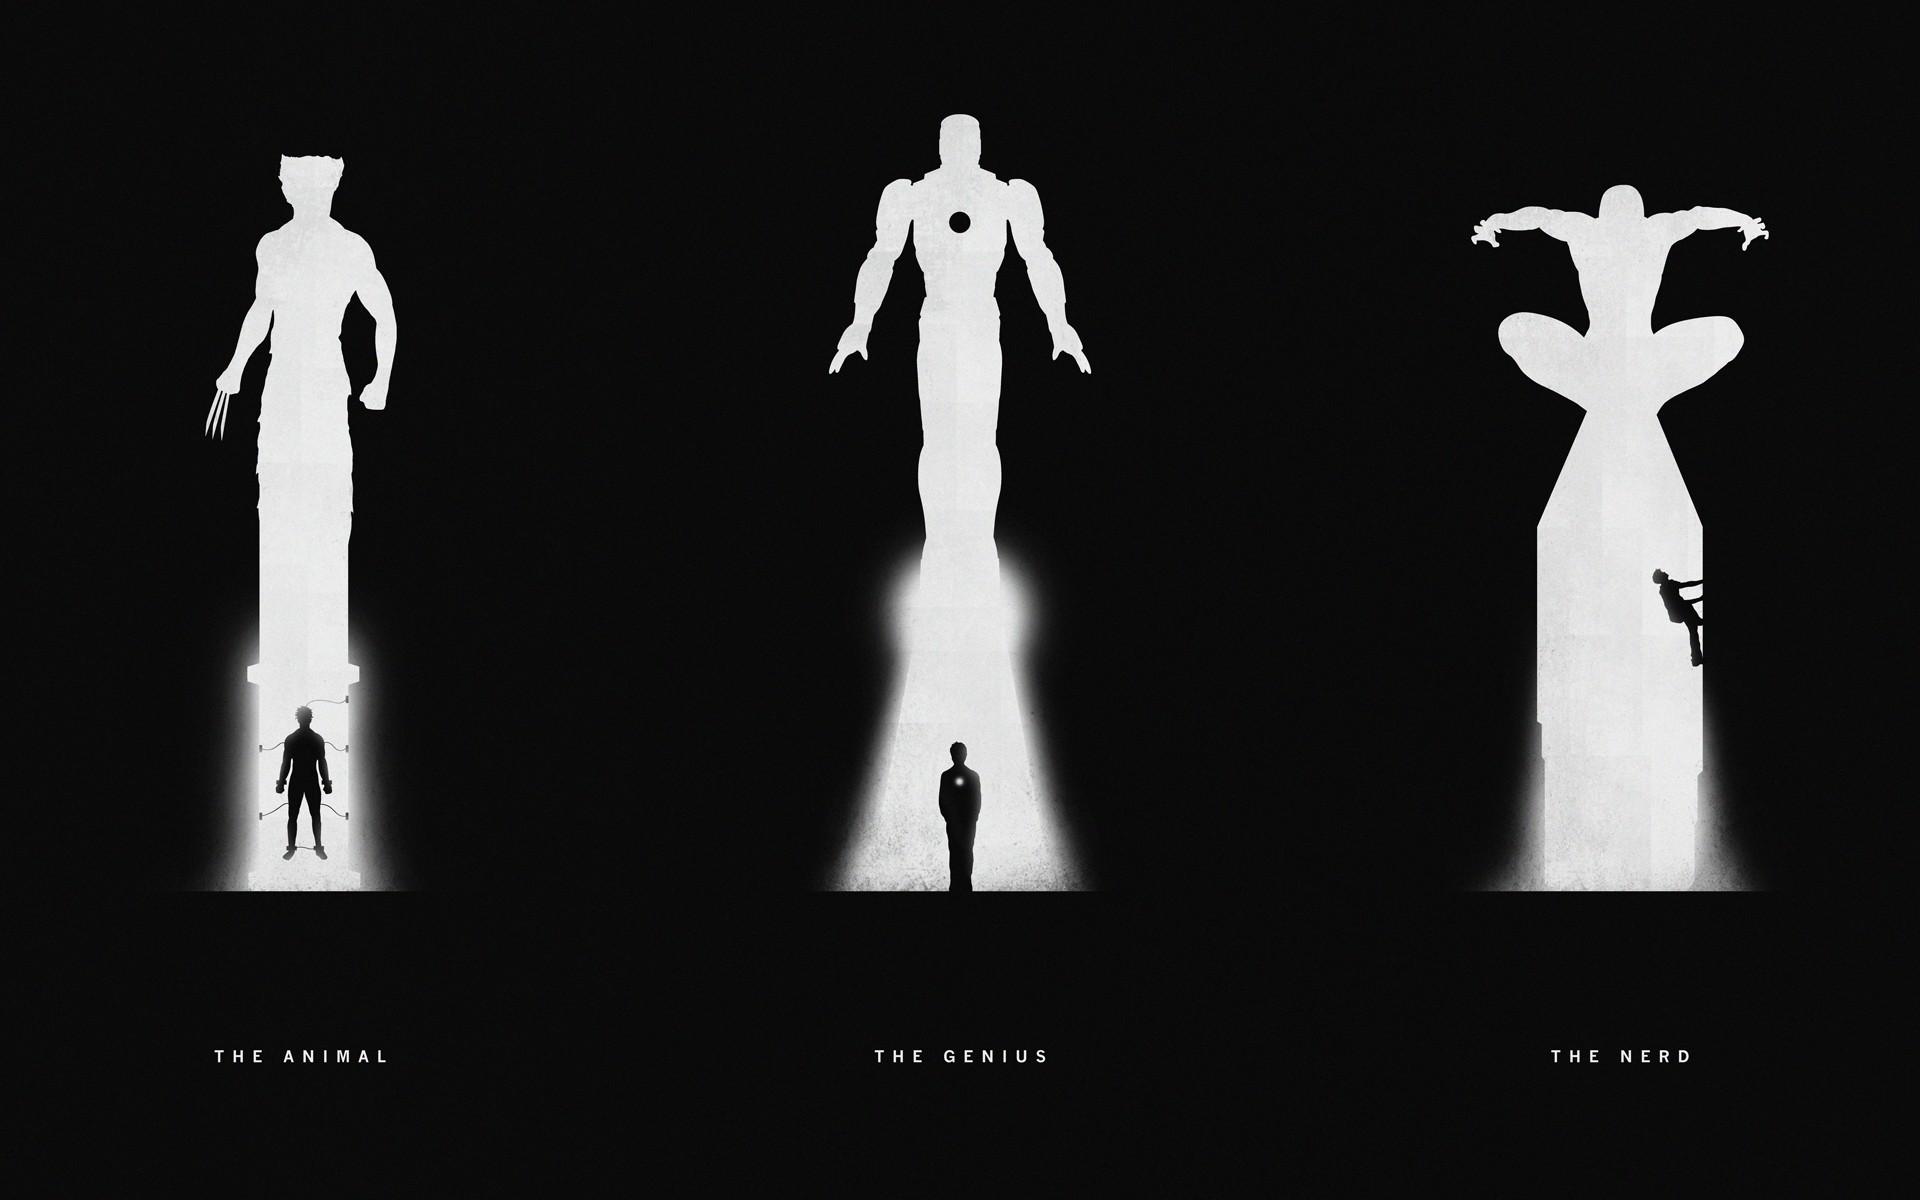 #Marvel Comics, #Wolverine, #Iron Man, #Spider-Man |